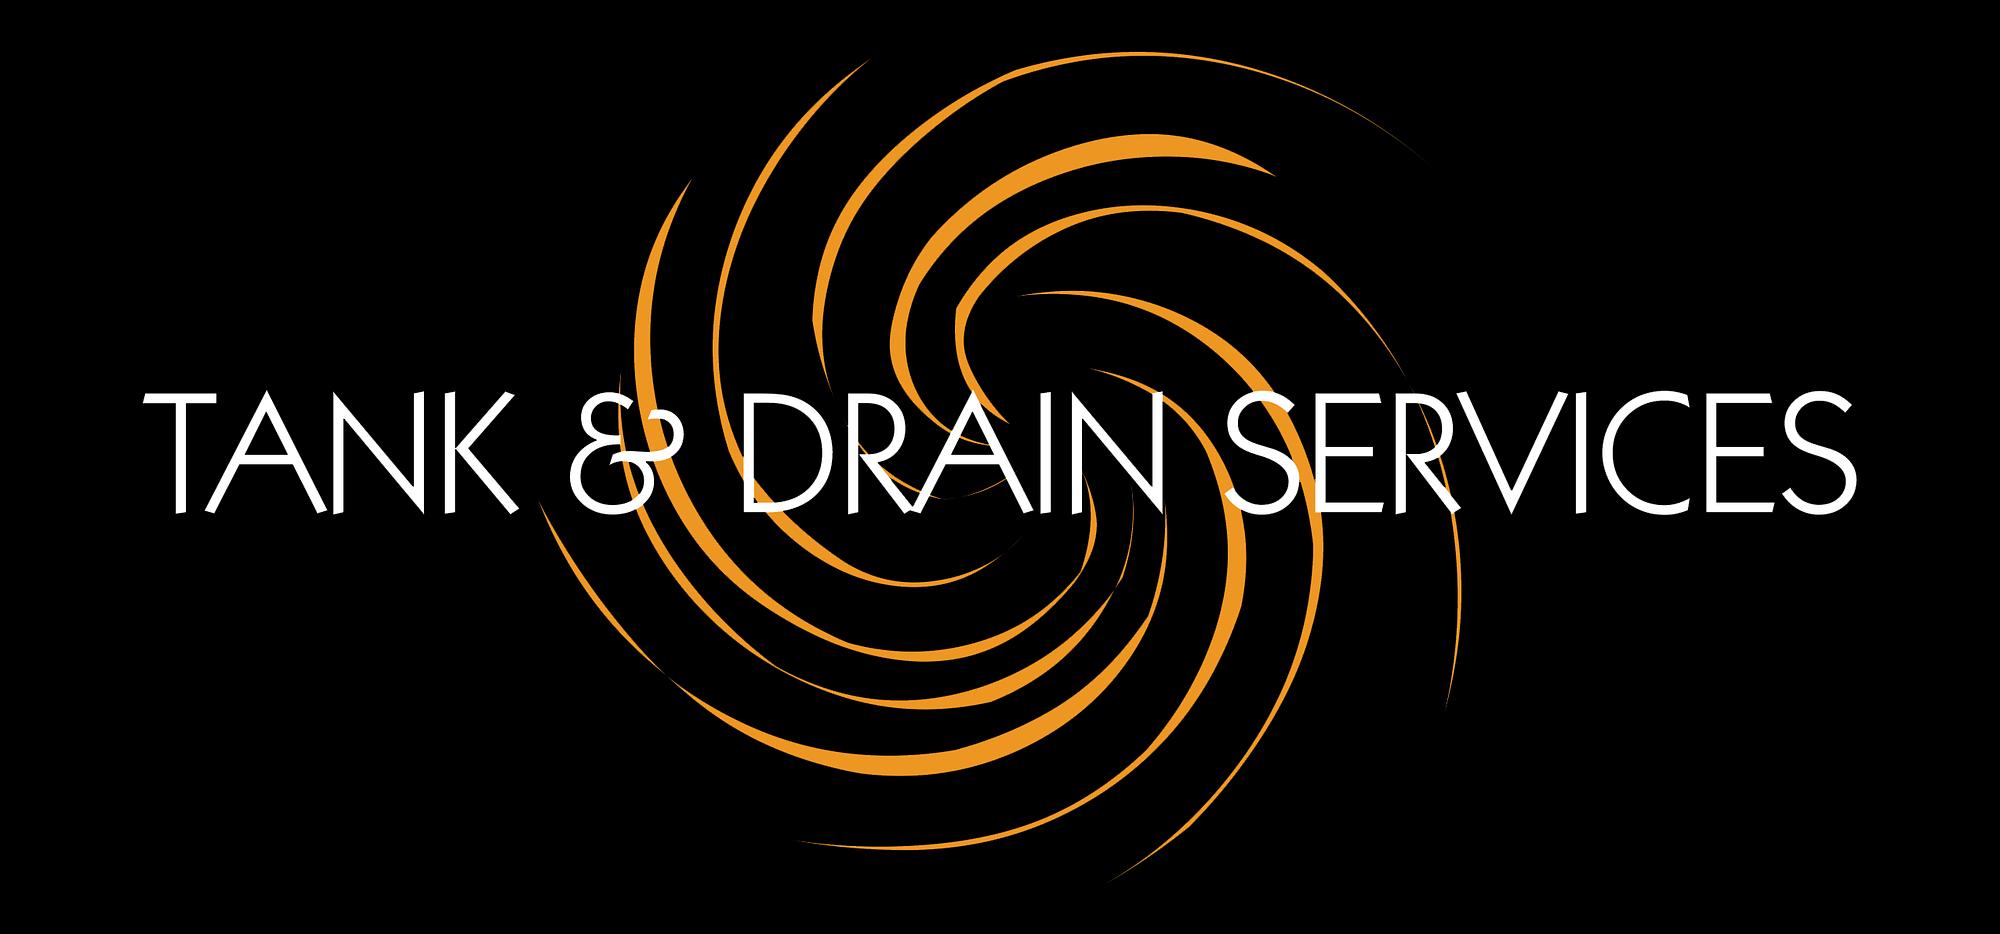 Tank and Drain